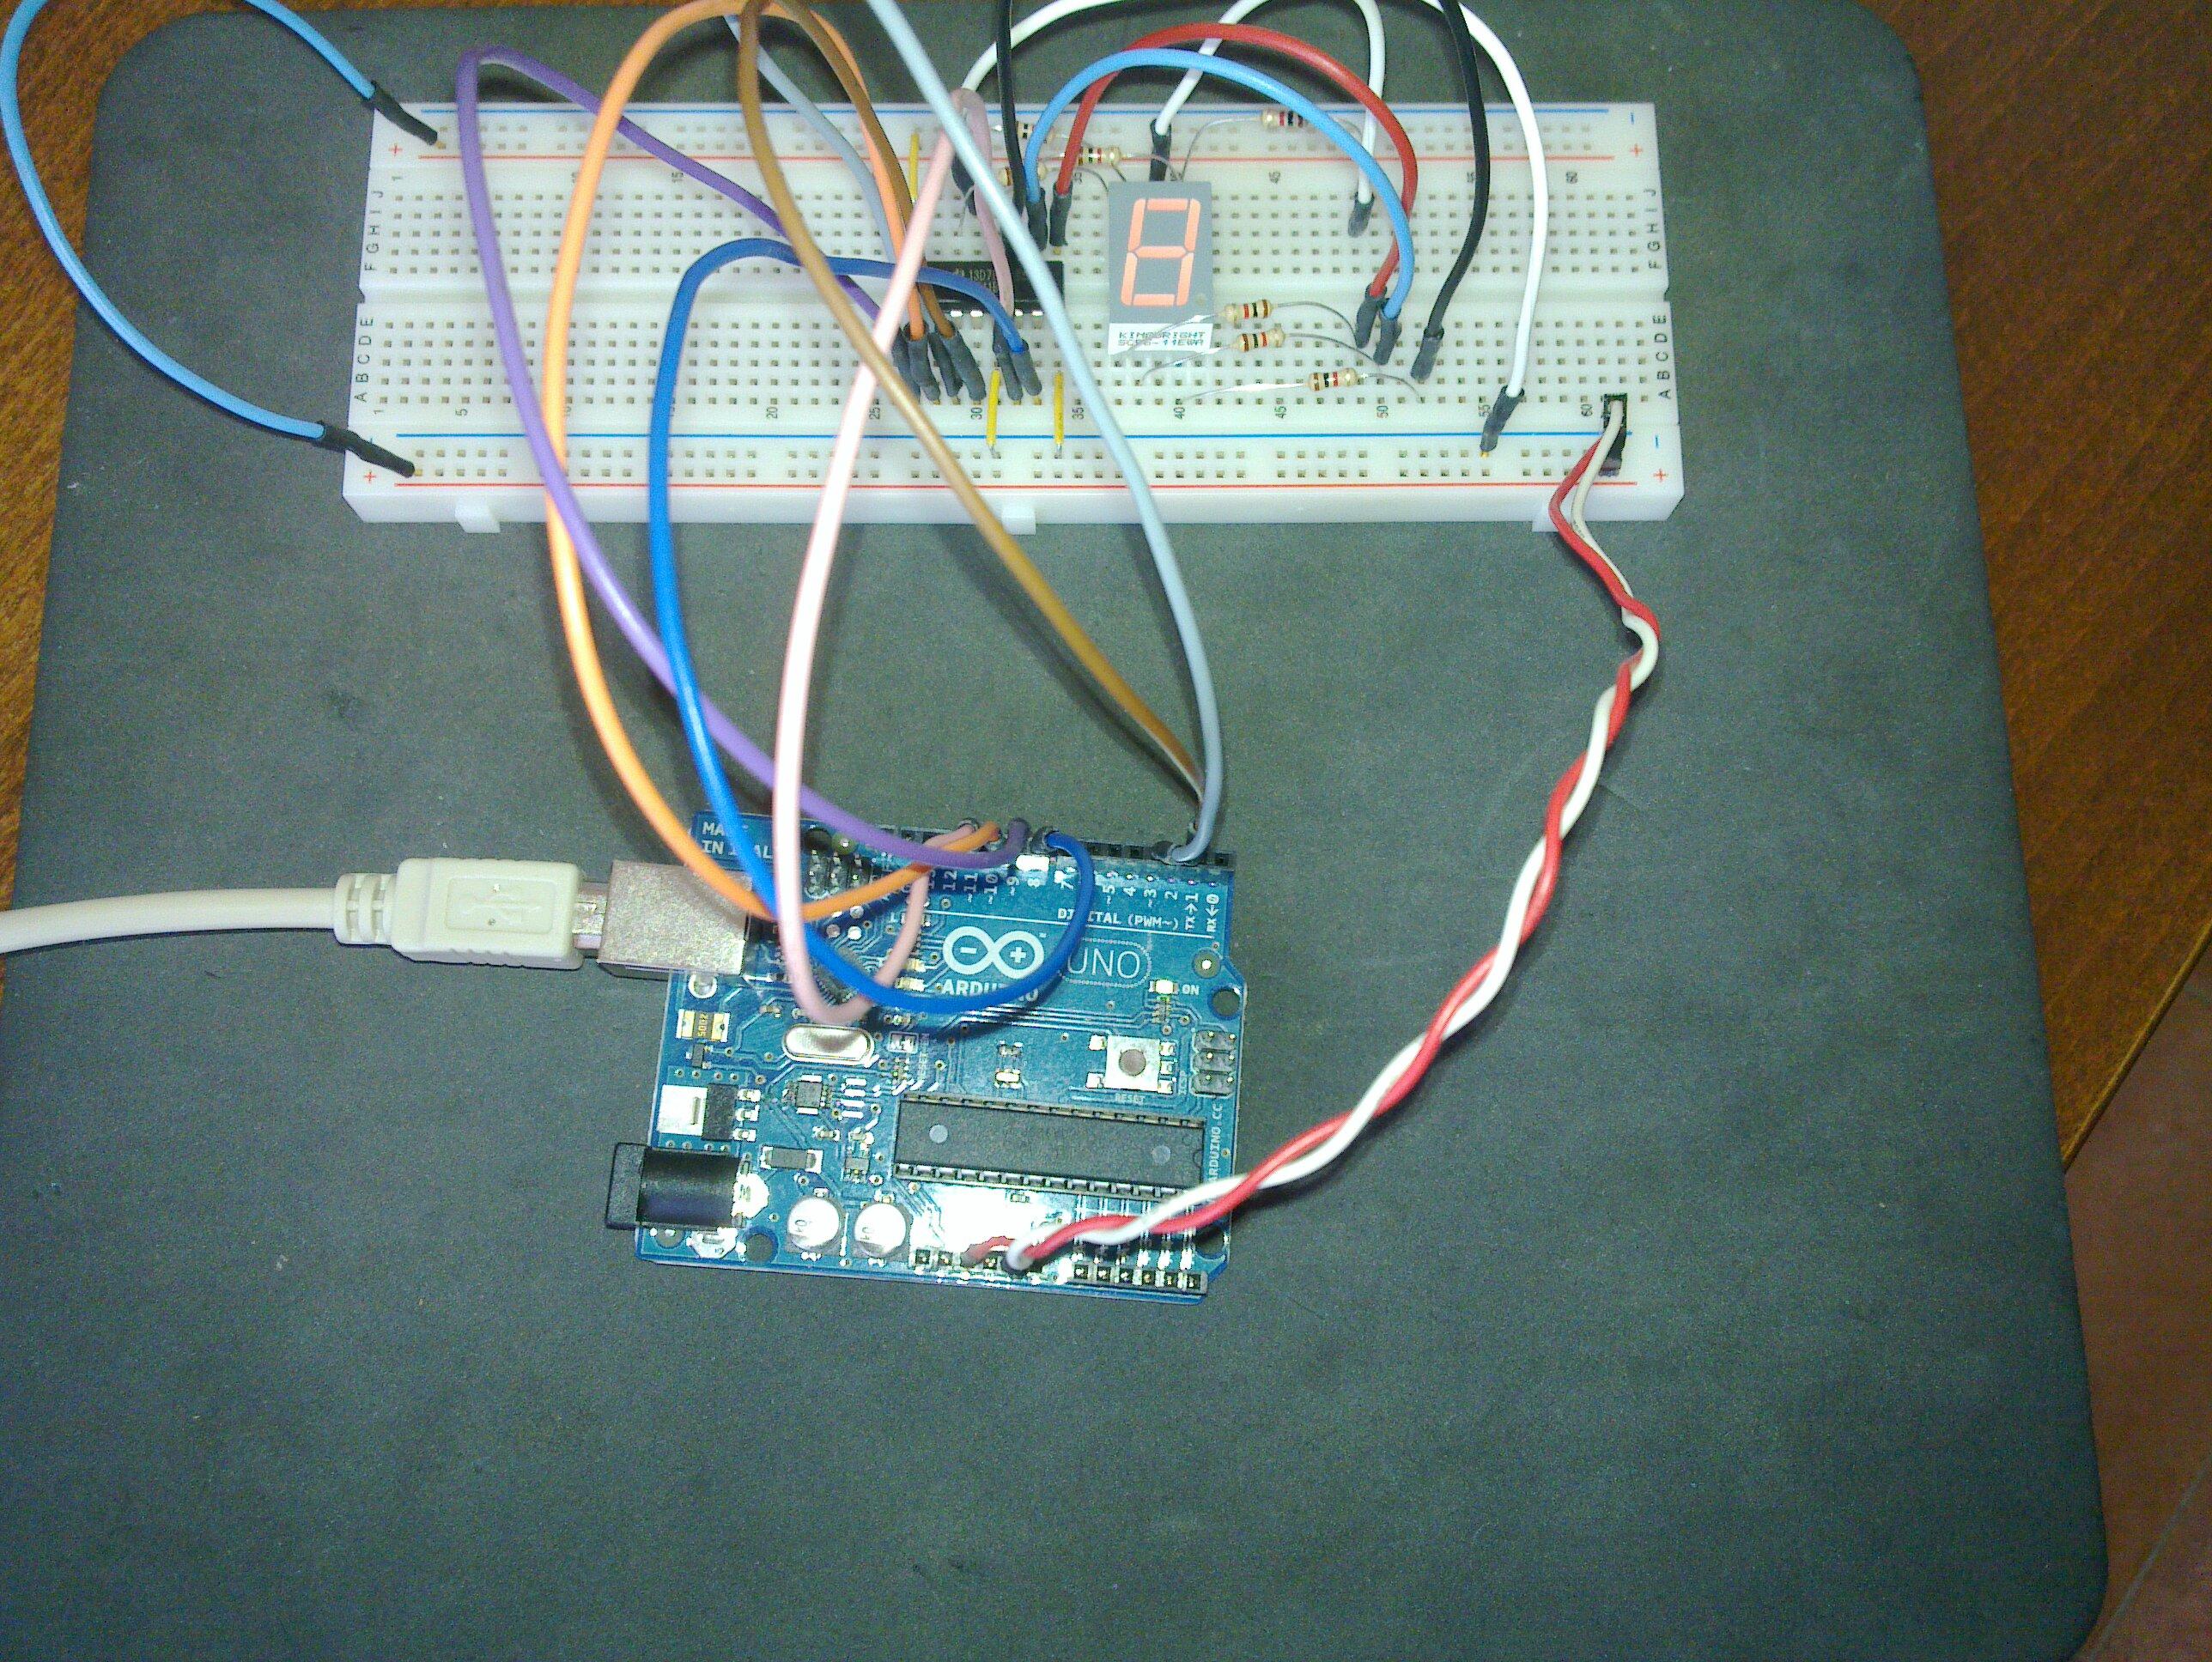 Arduino UNO running 4-digit 7-segment display